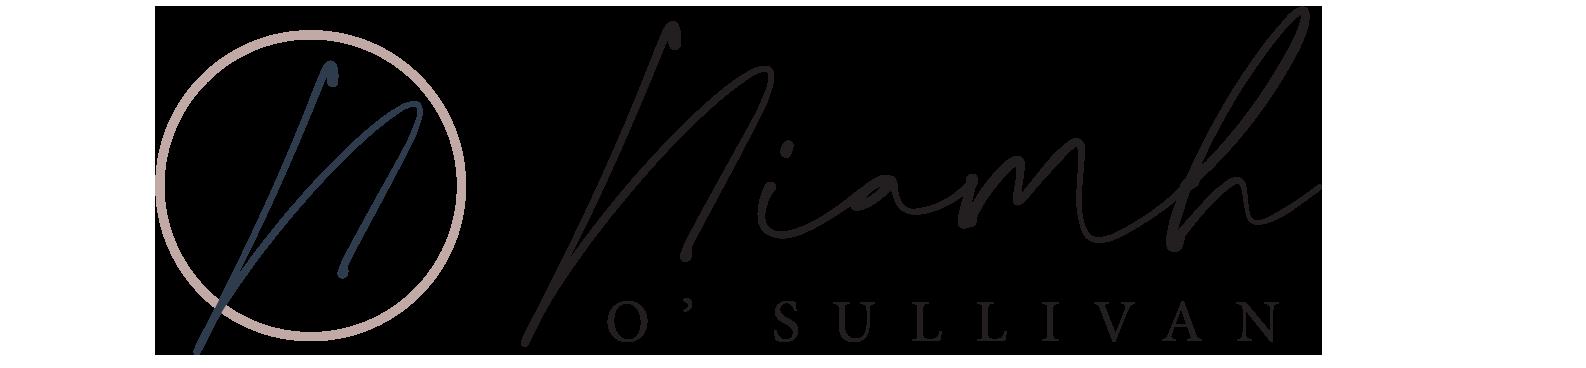 niamh-osullivan.com